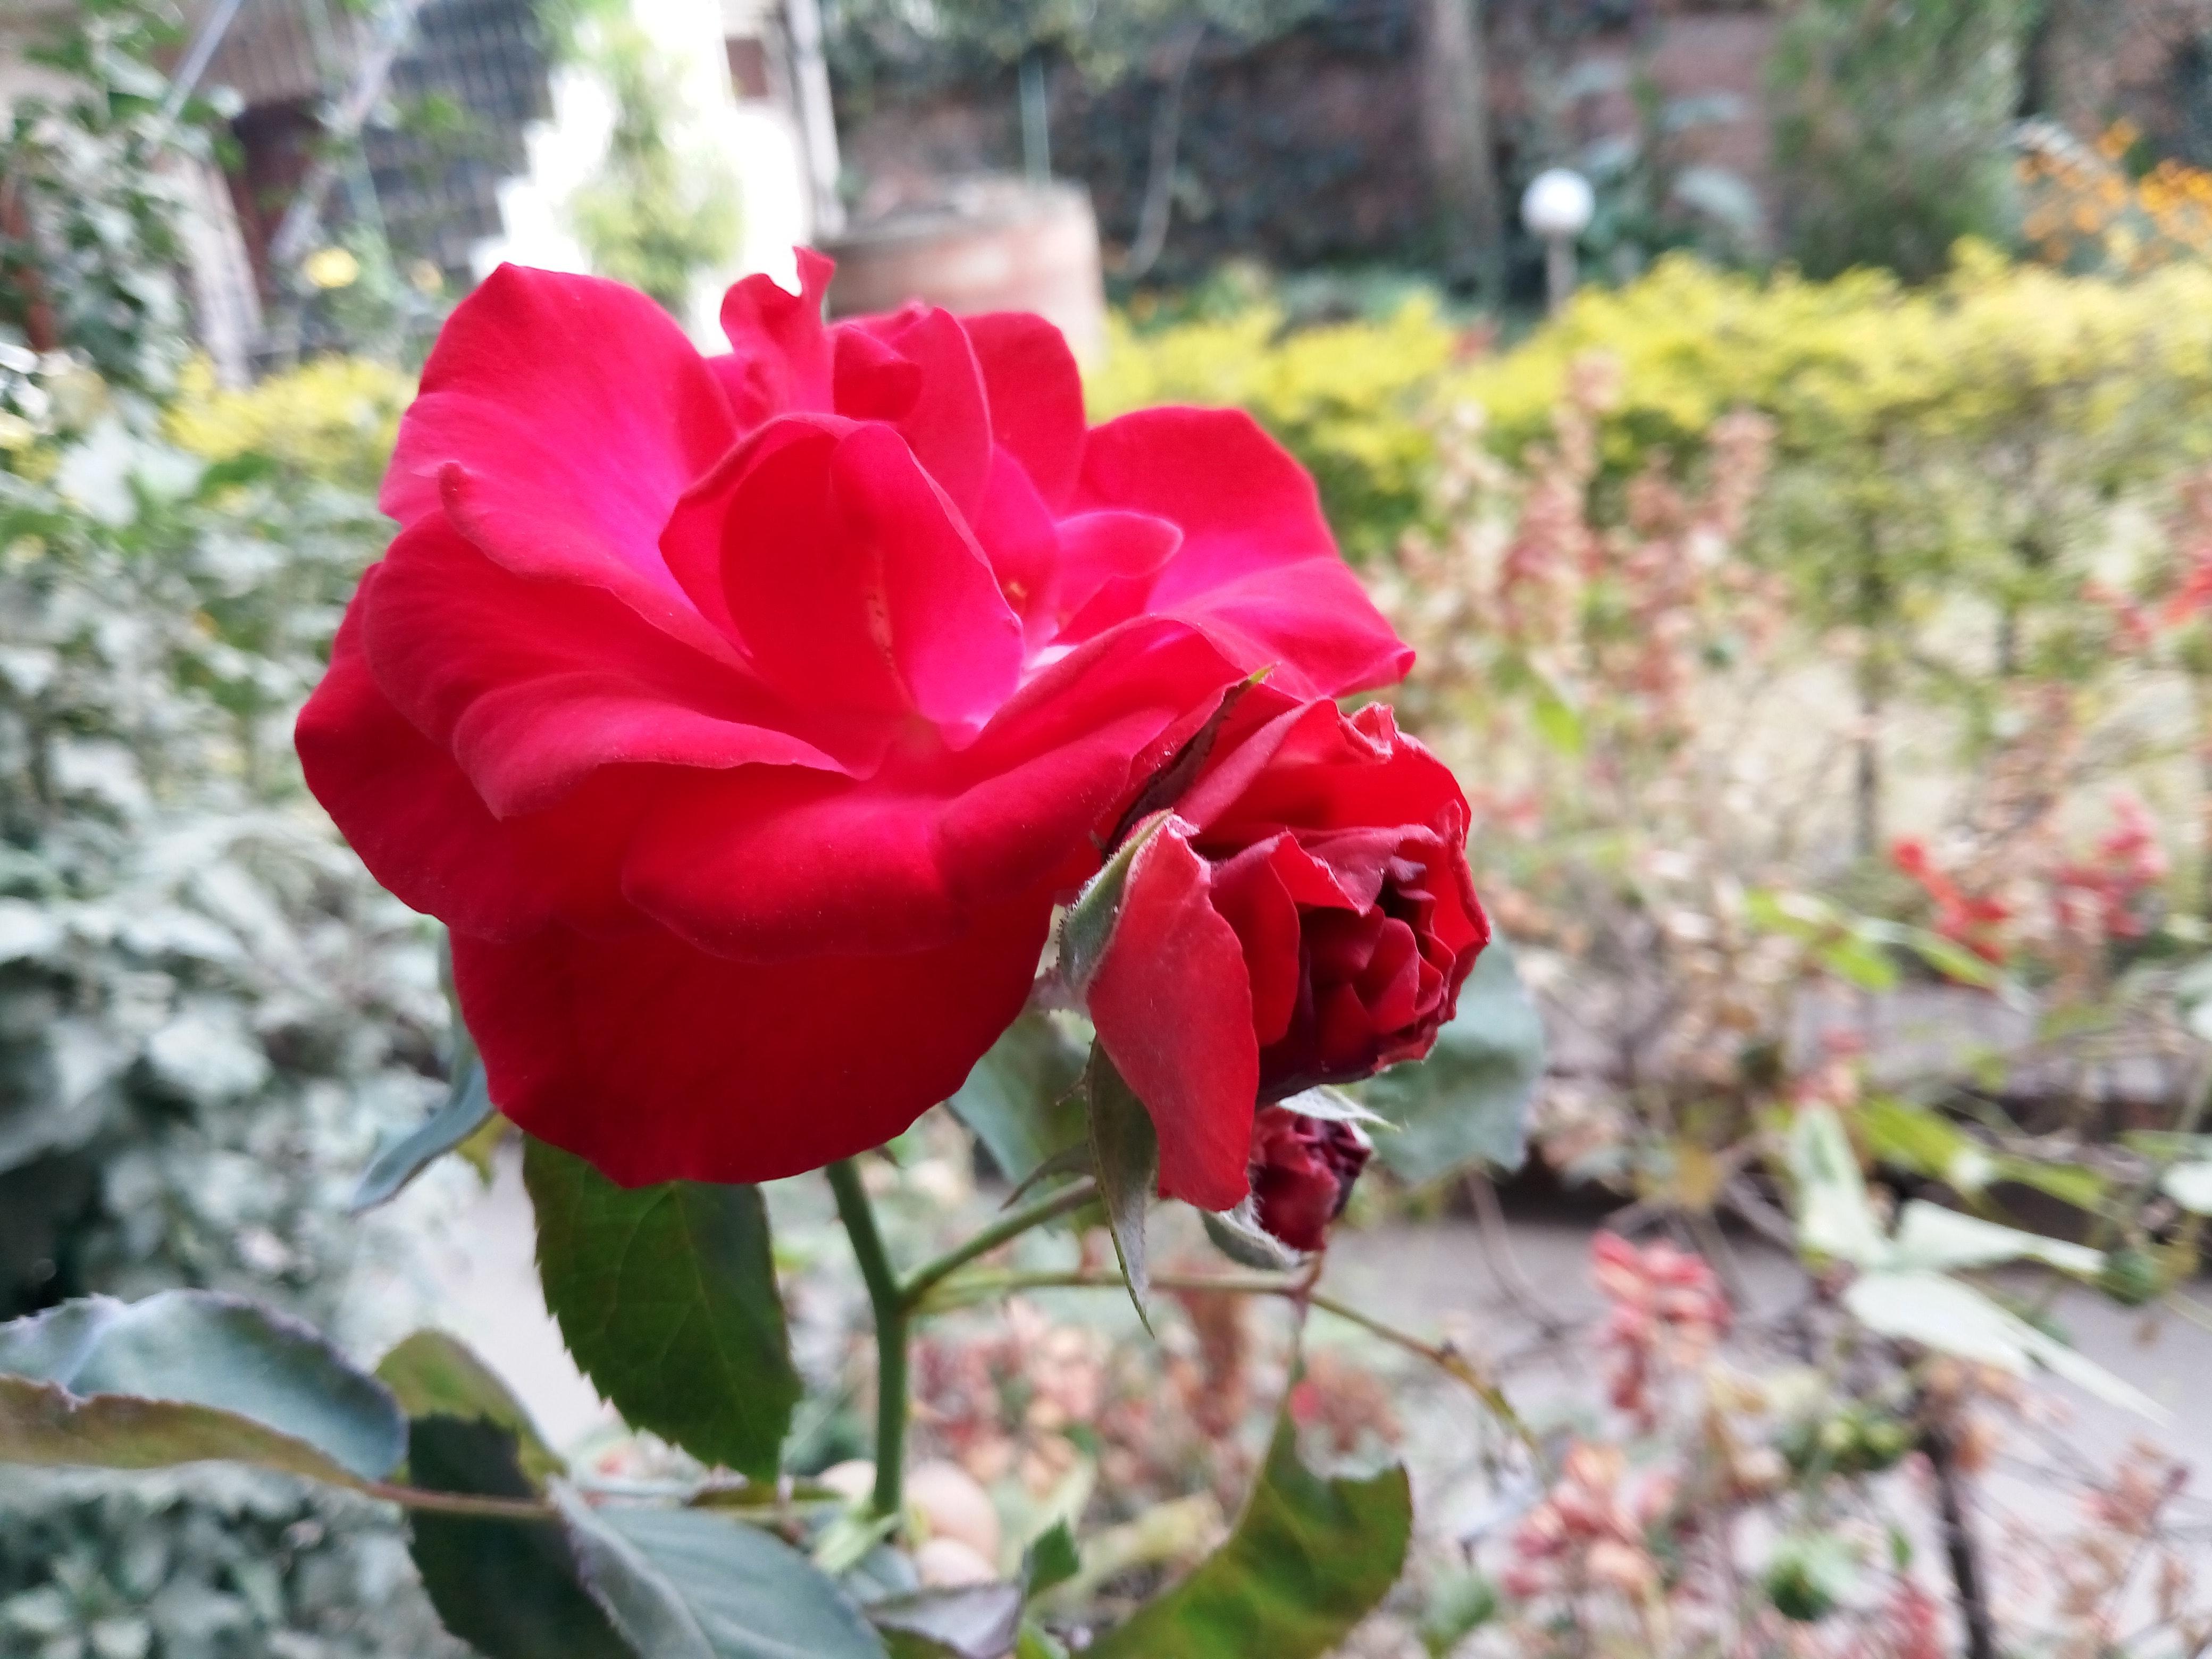 Free stock photo of beautiful flower red rose free download izmirmasajfo